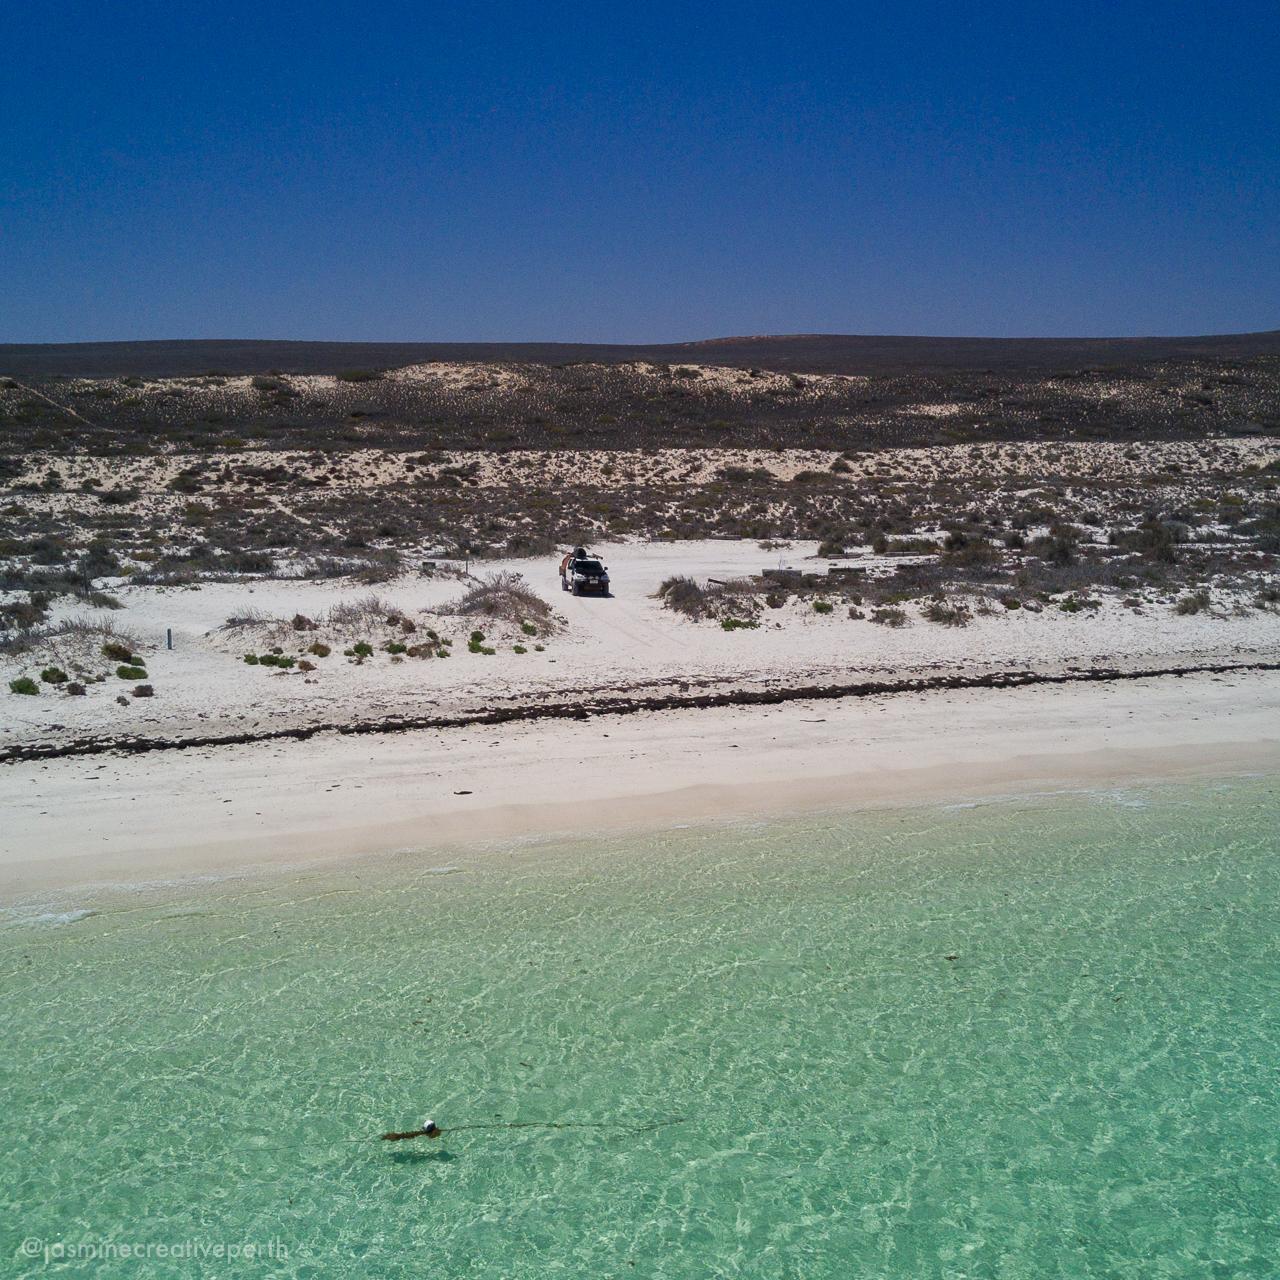 waroora station ningaloo coral bay beach ocean aerial landscape photography jasmine creative body perth (2 of 4).jpg